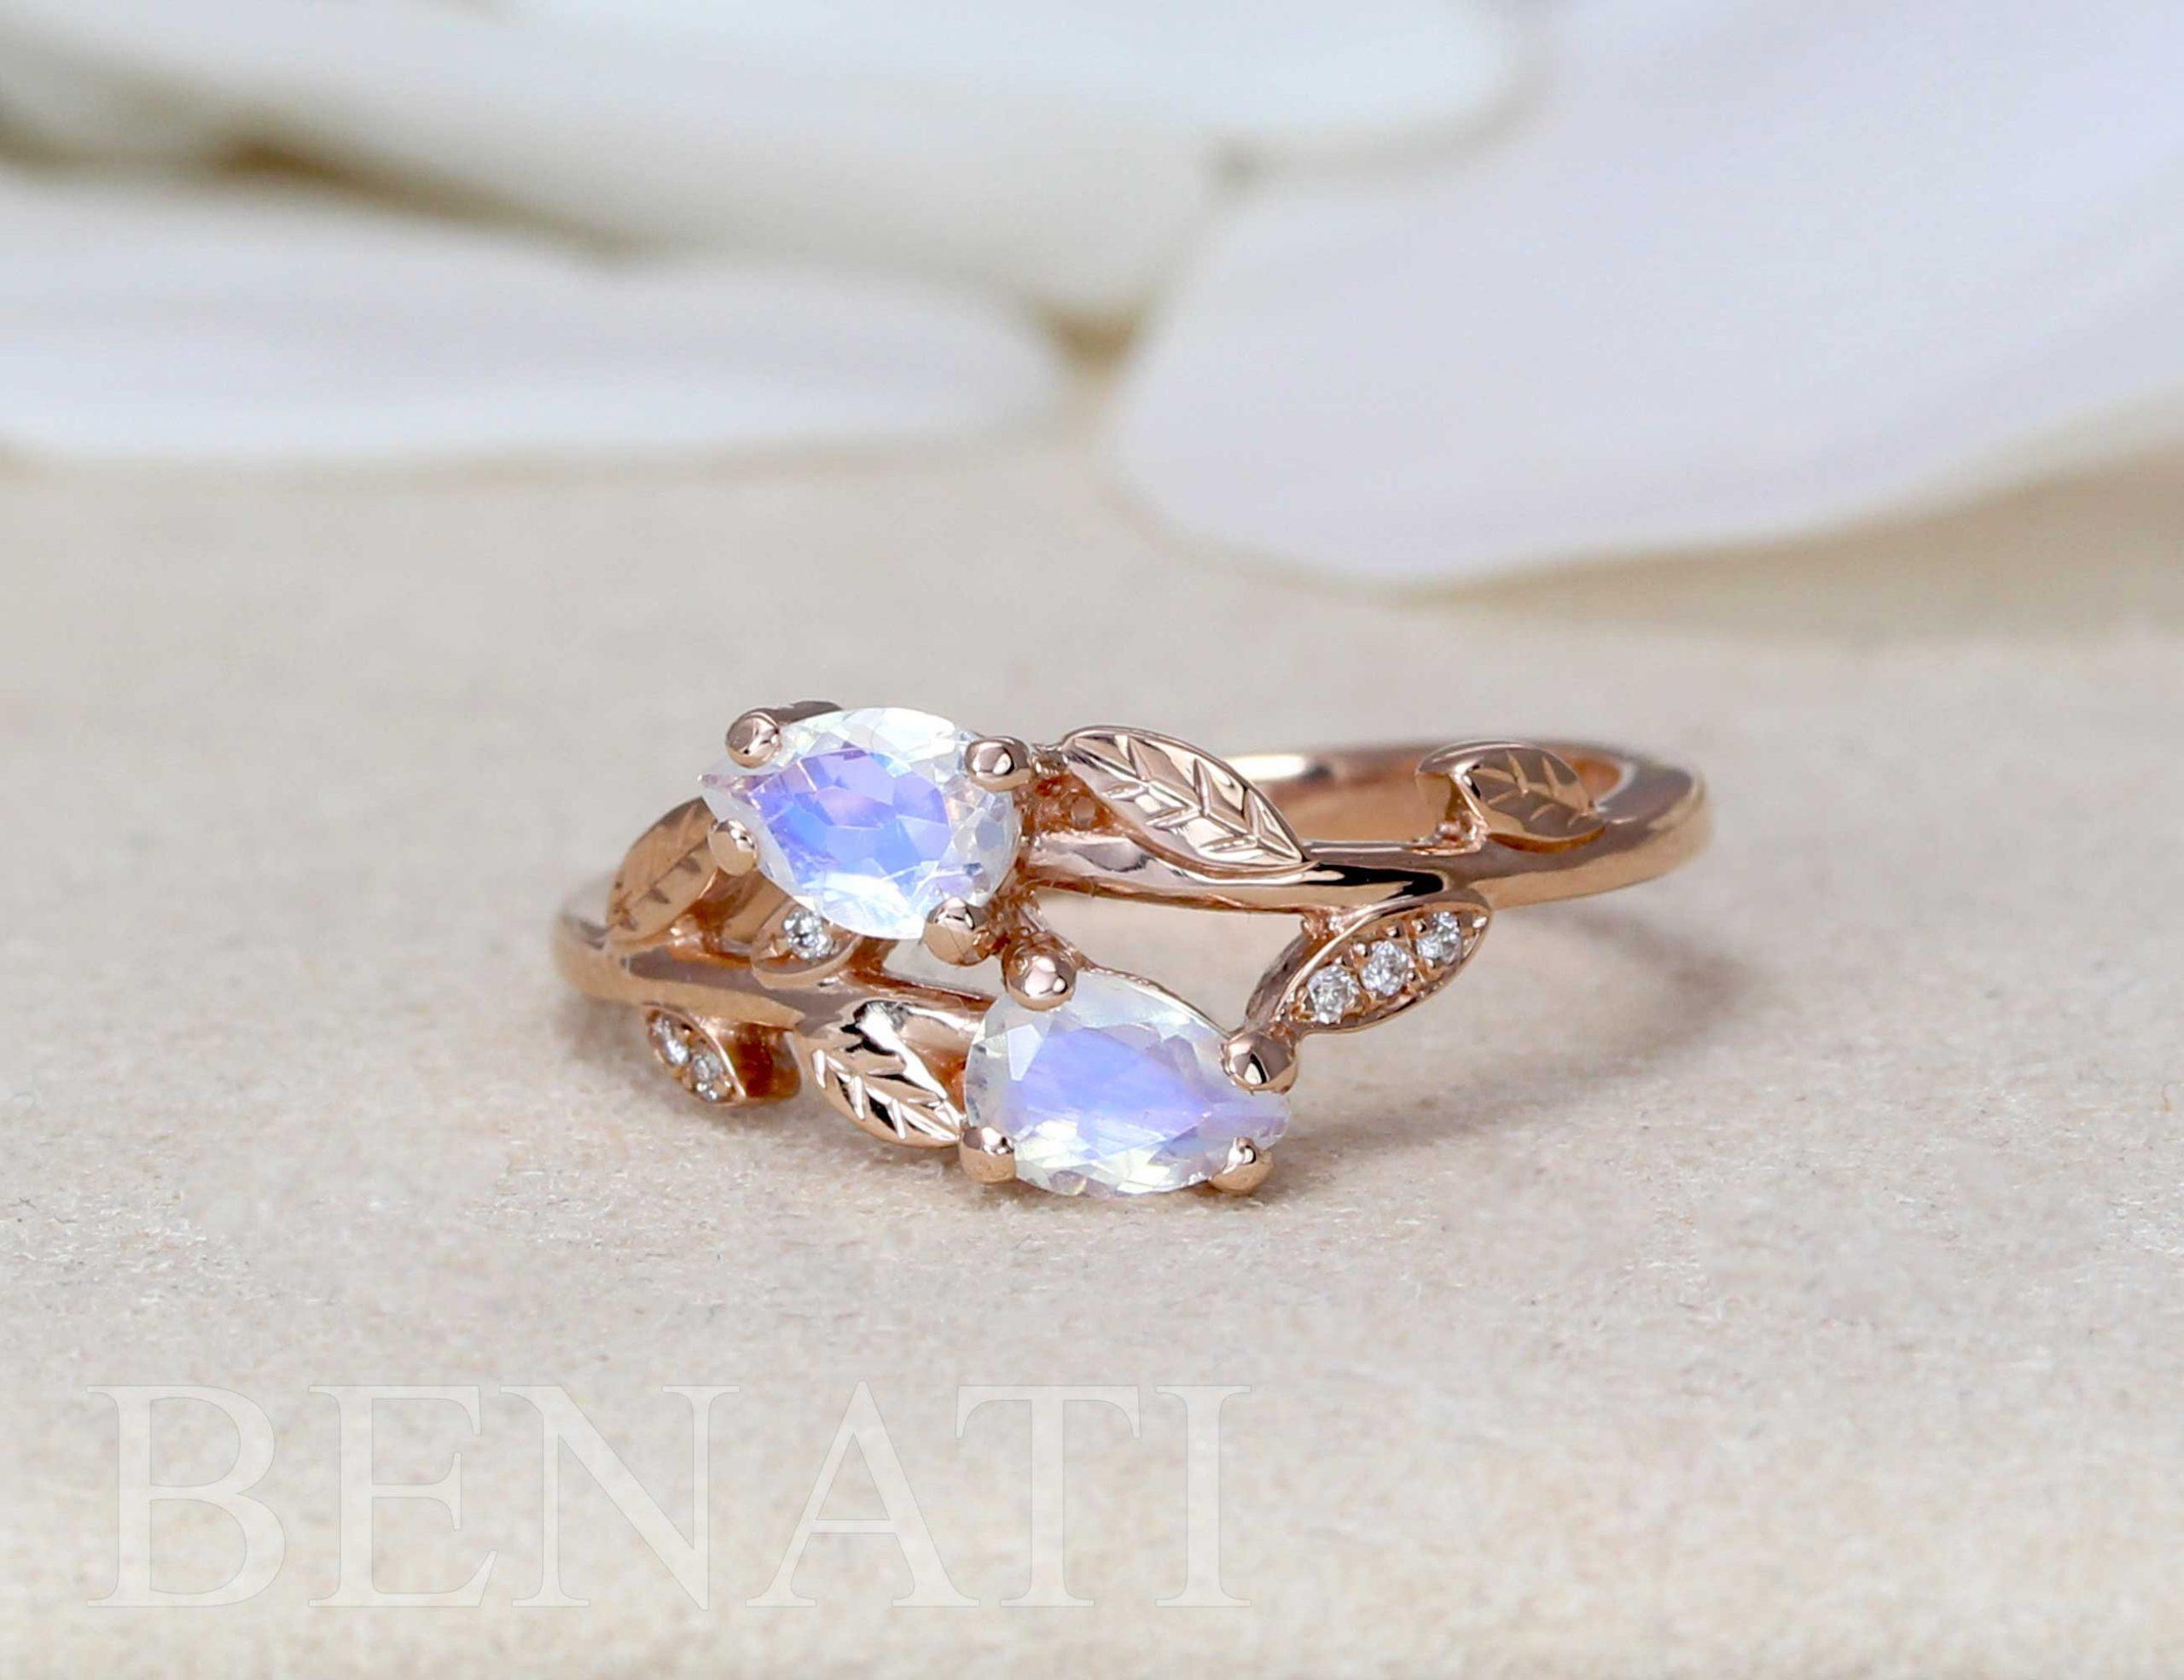 Pear Cut Rainbow Moonstone Nature Inspired Ring Vintage Moonstone Engagement Ring In Rose Gold Benati